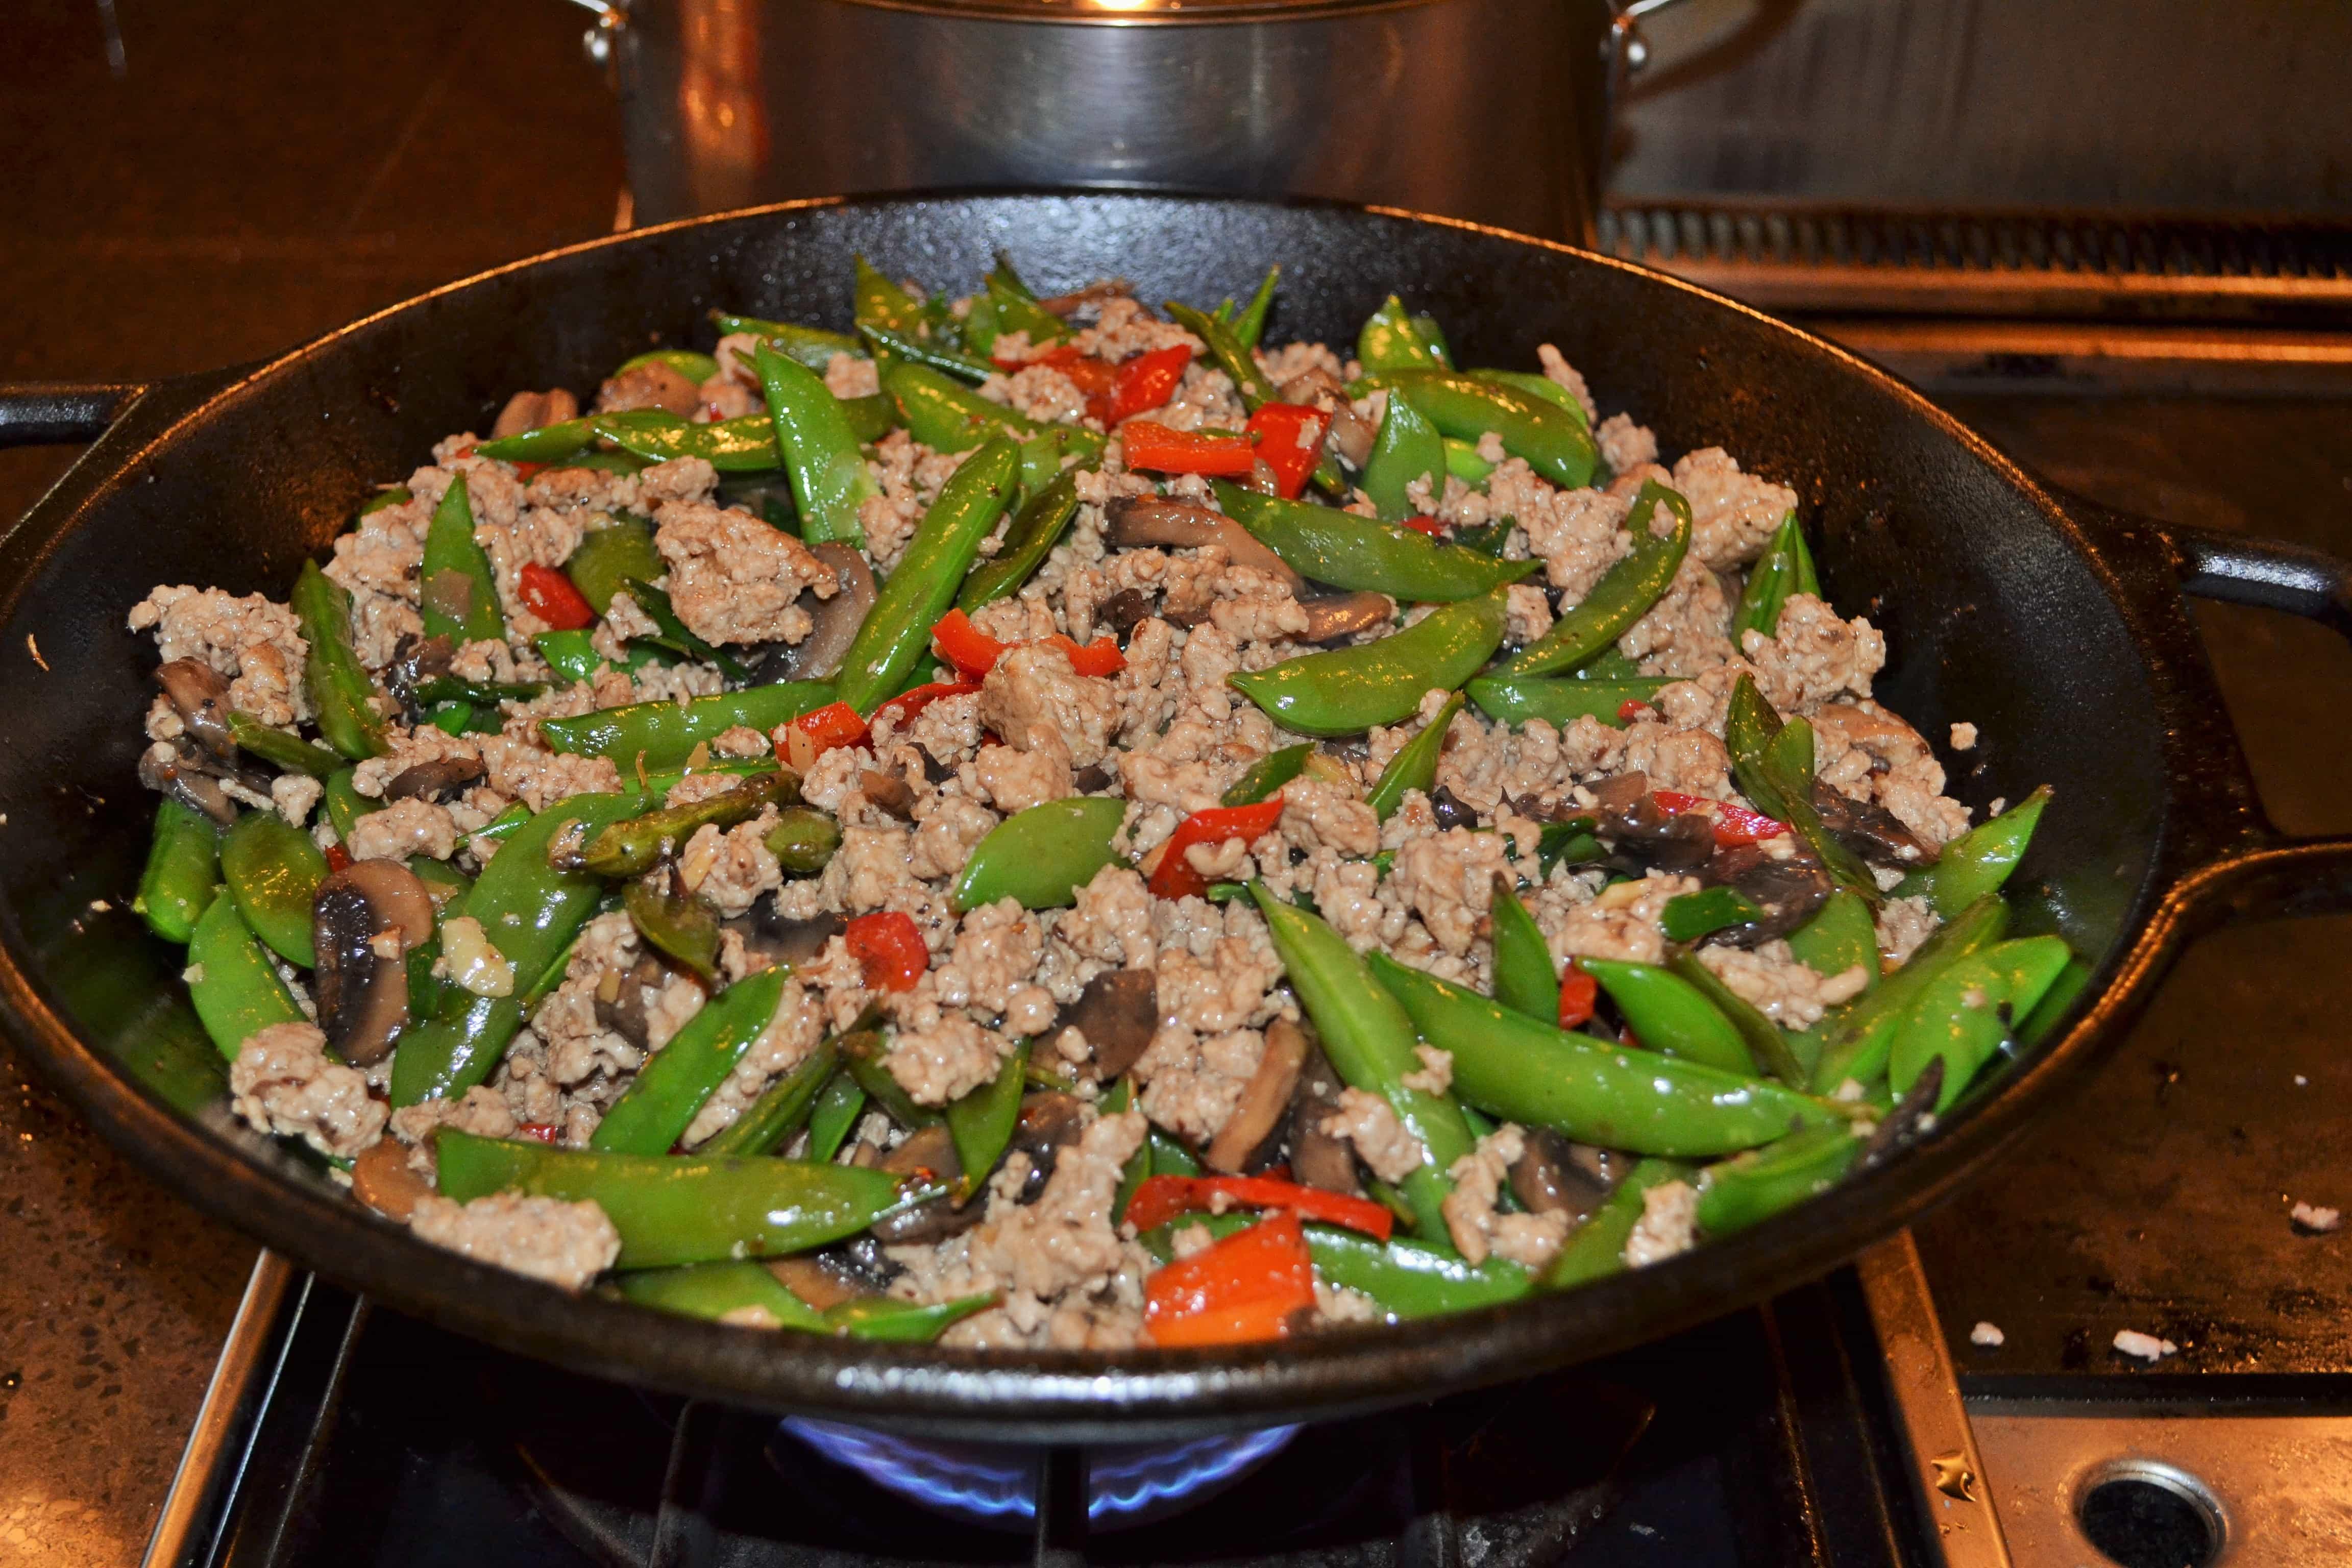 Easy Pork Stir Fry To Cook For A Crowd